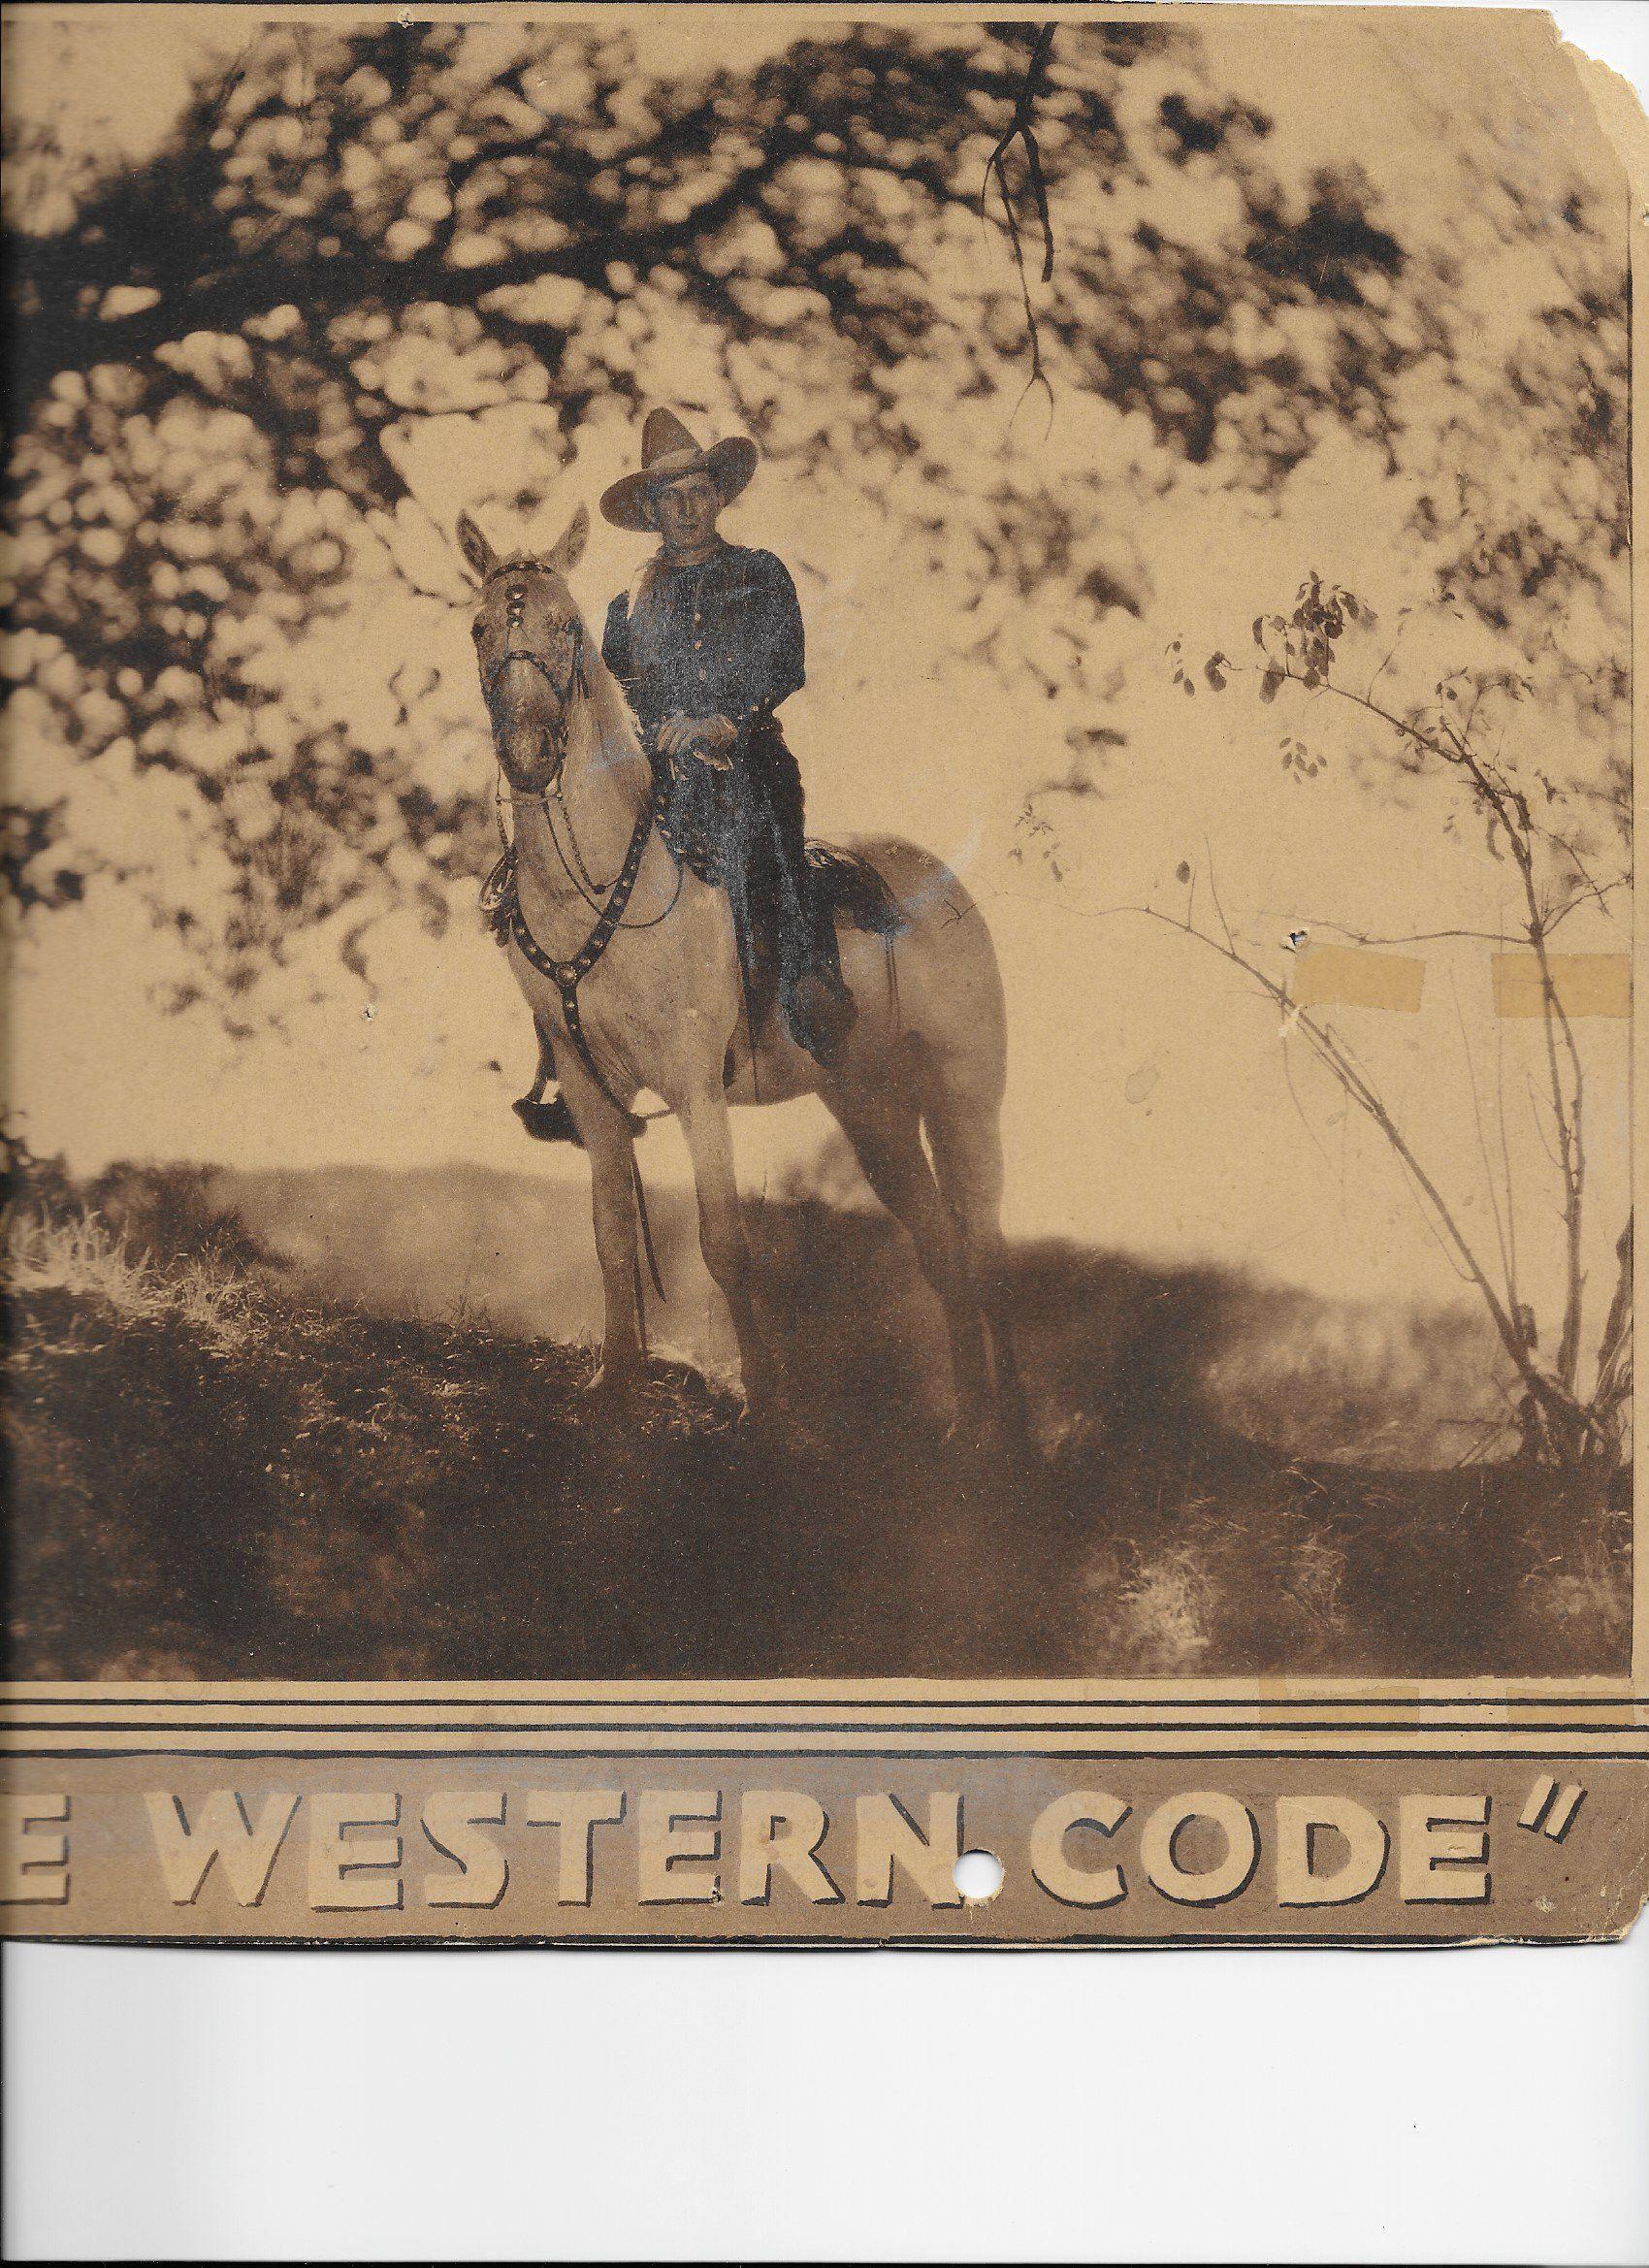 Tim McCoy in The Western Code (1932)